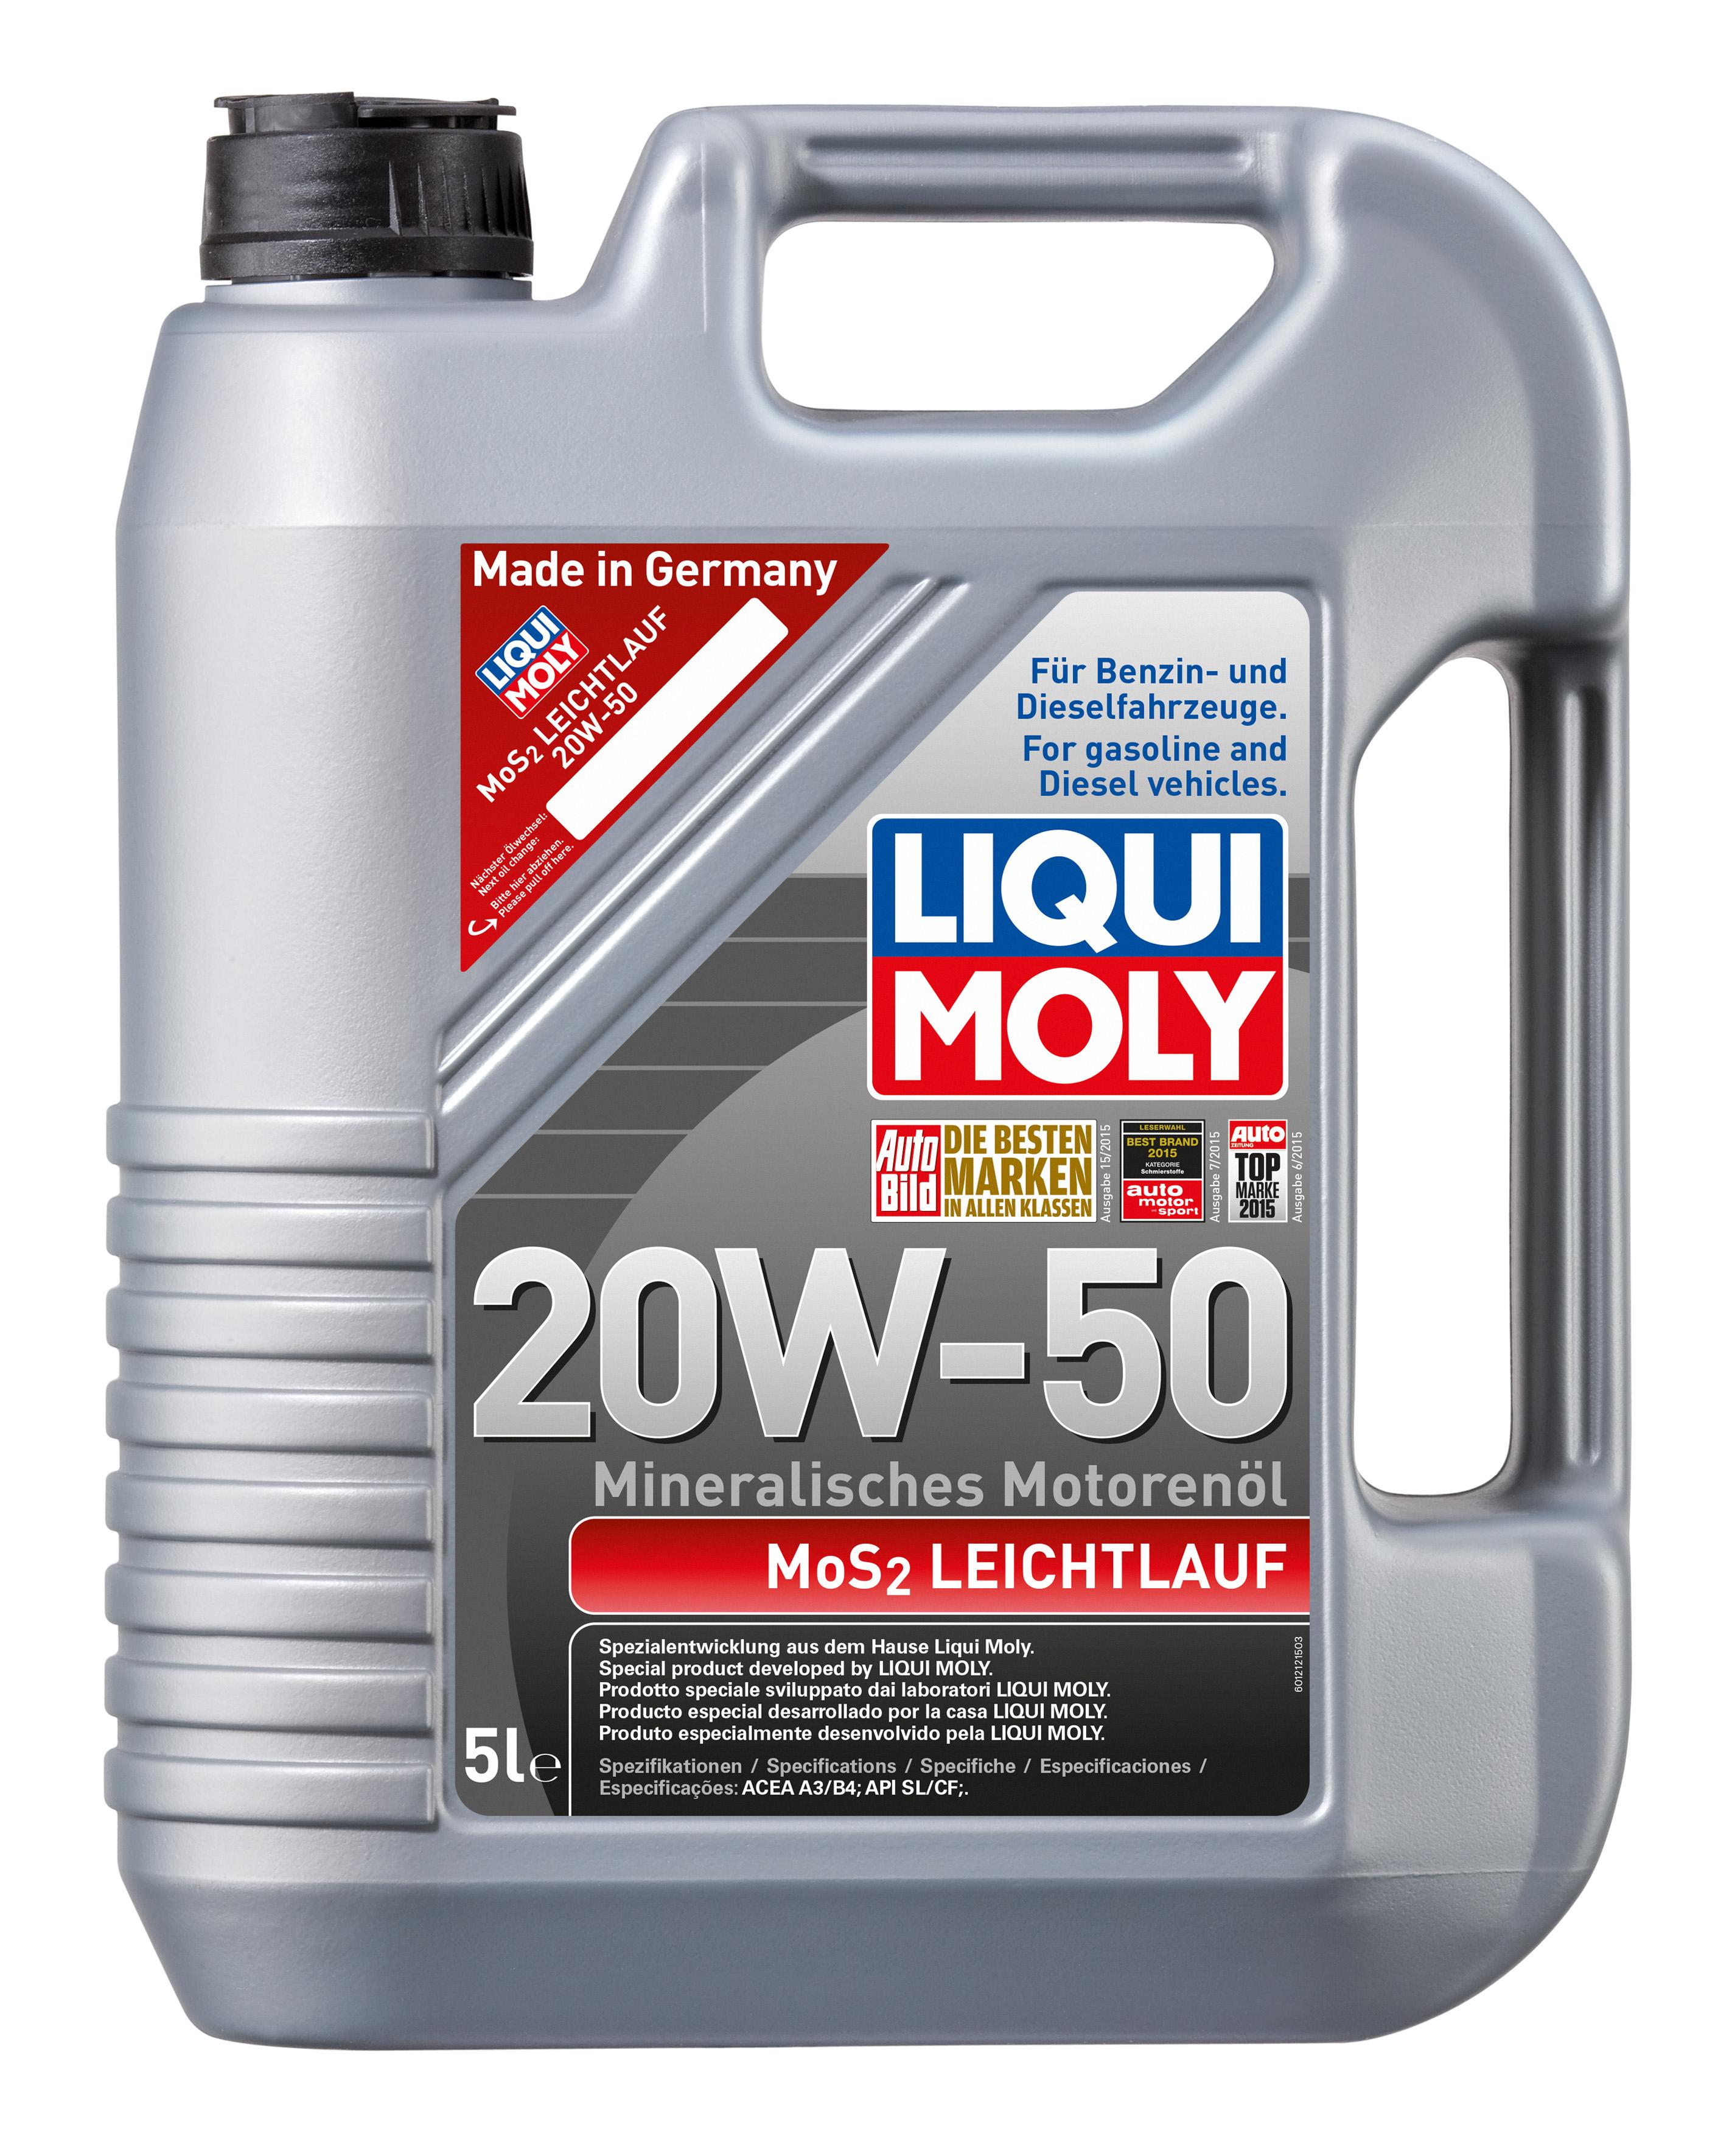 liqui moly mos2 engine oil 20w 50 5l ebay. Black Bedroom Furniture Sets. Home Design Ideas